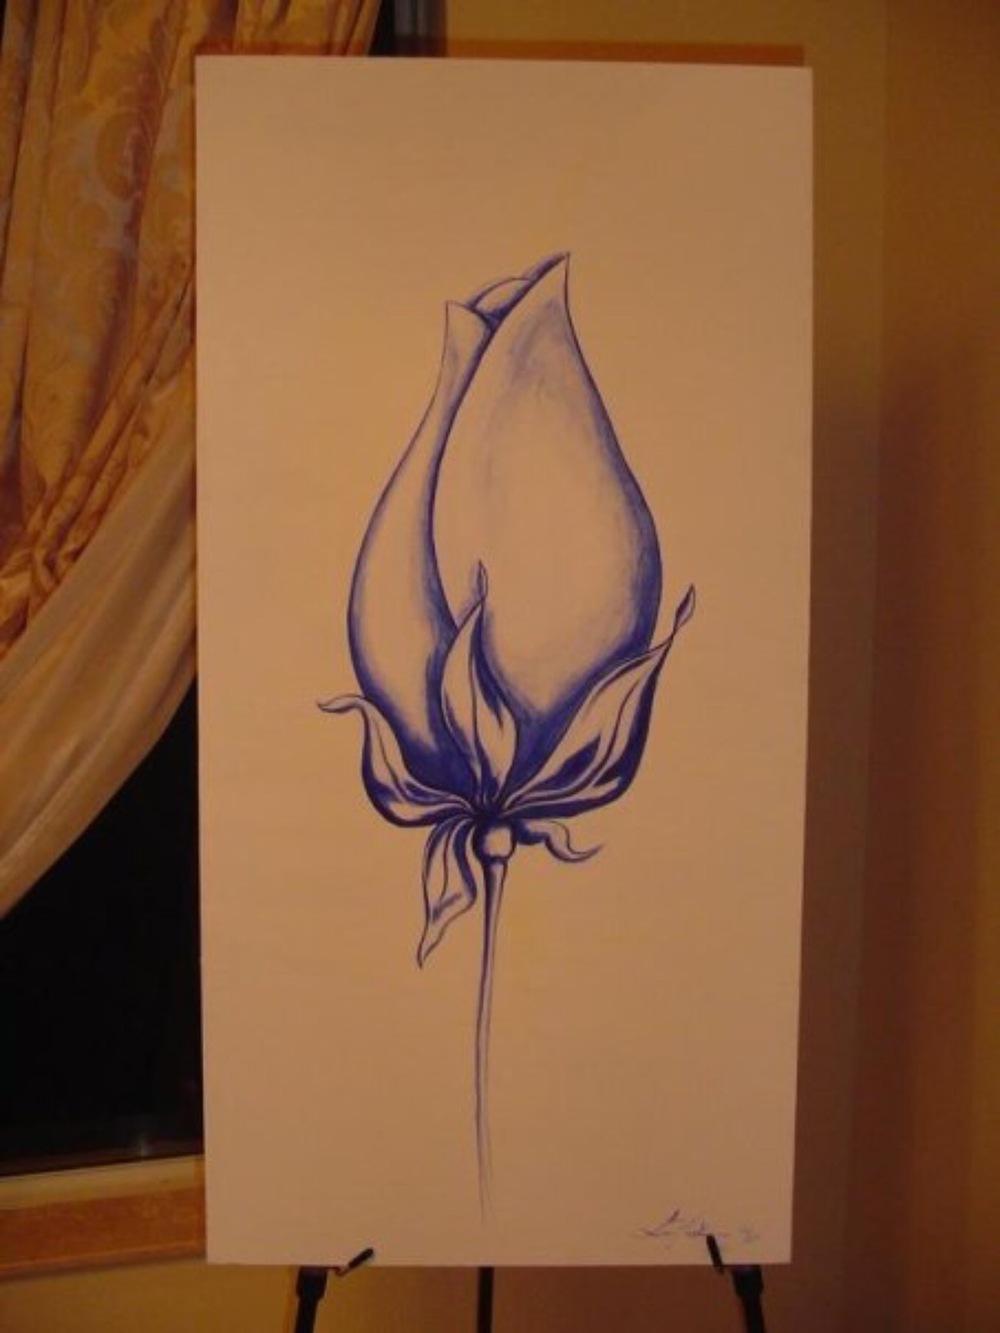 Bespoke Art by Liisa Garceau - Blue rose Acrylic on canvas.